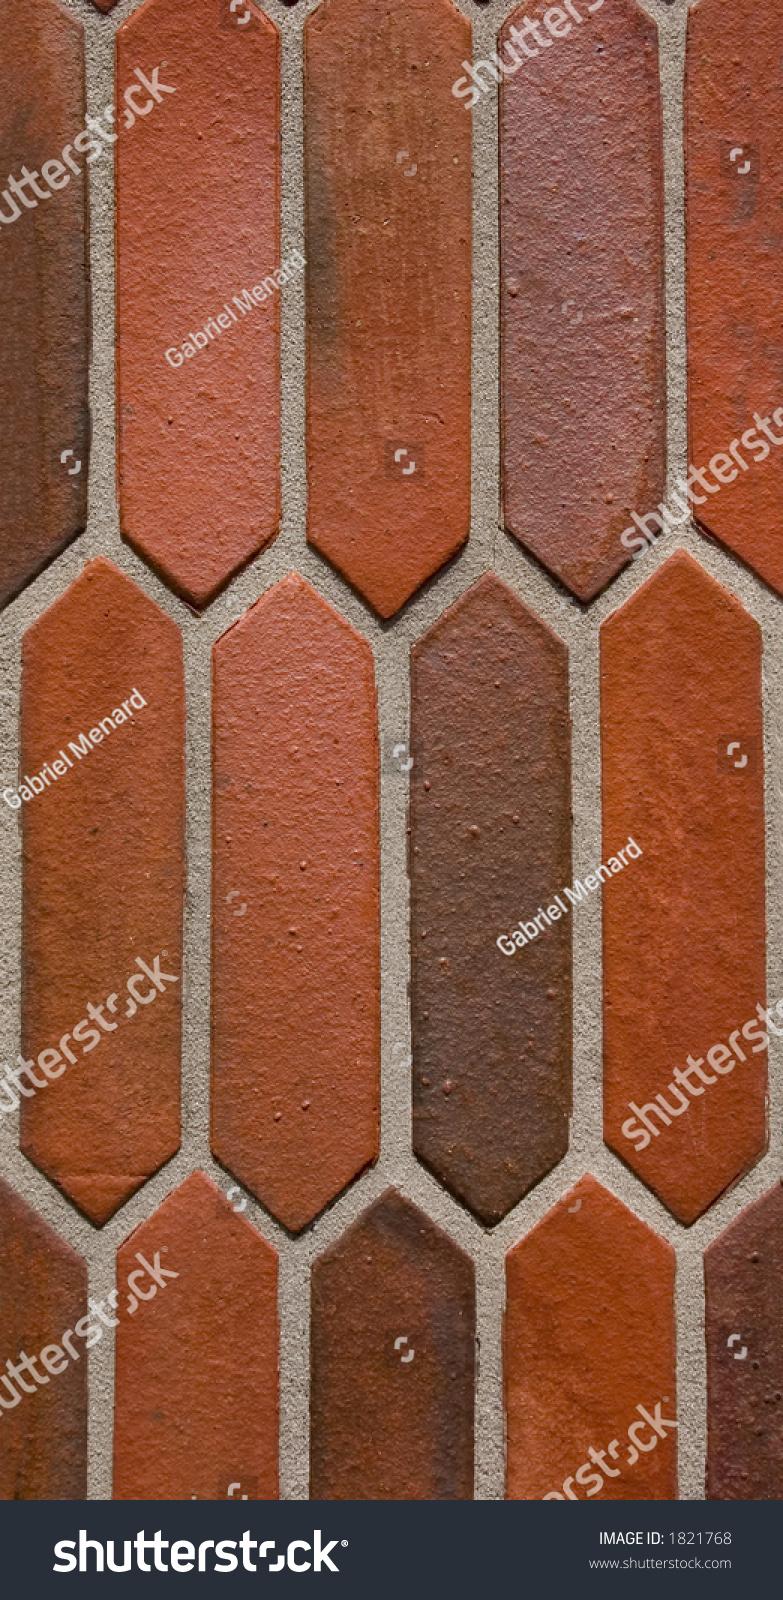 Texture Brique Stock Photo 1821768 : Shutterstock